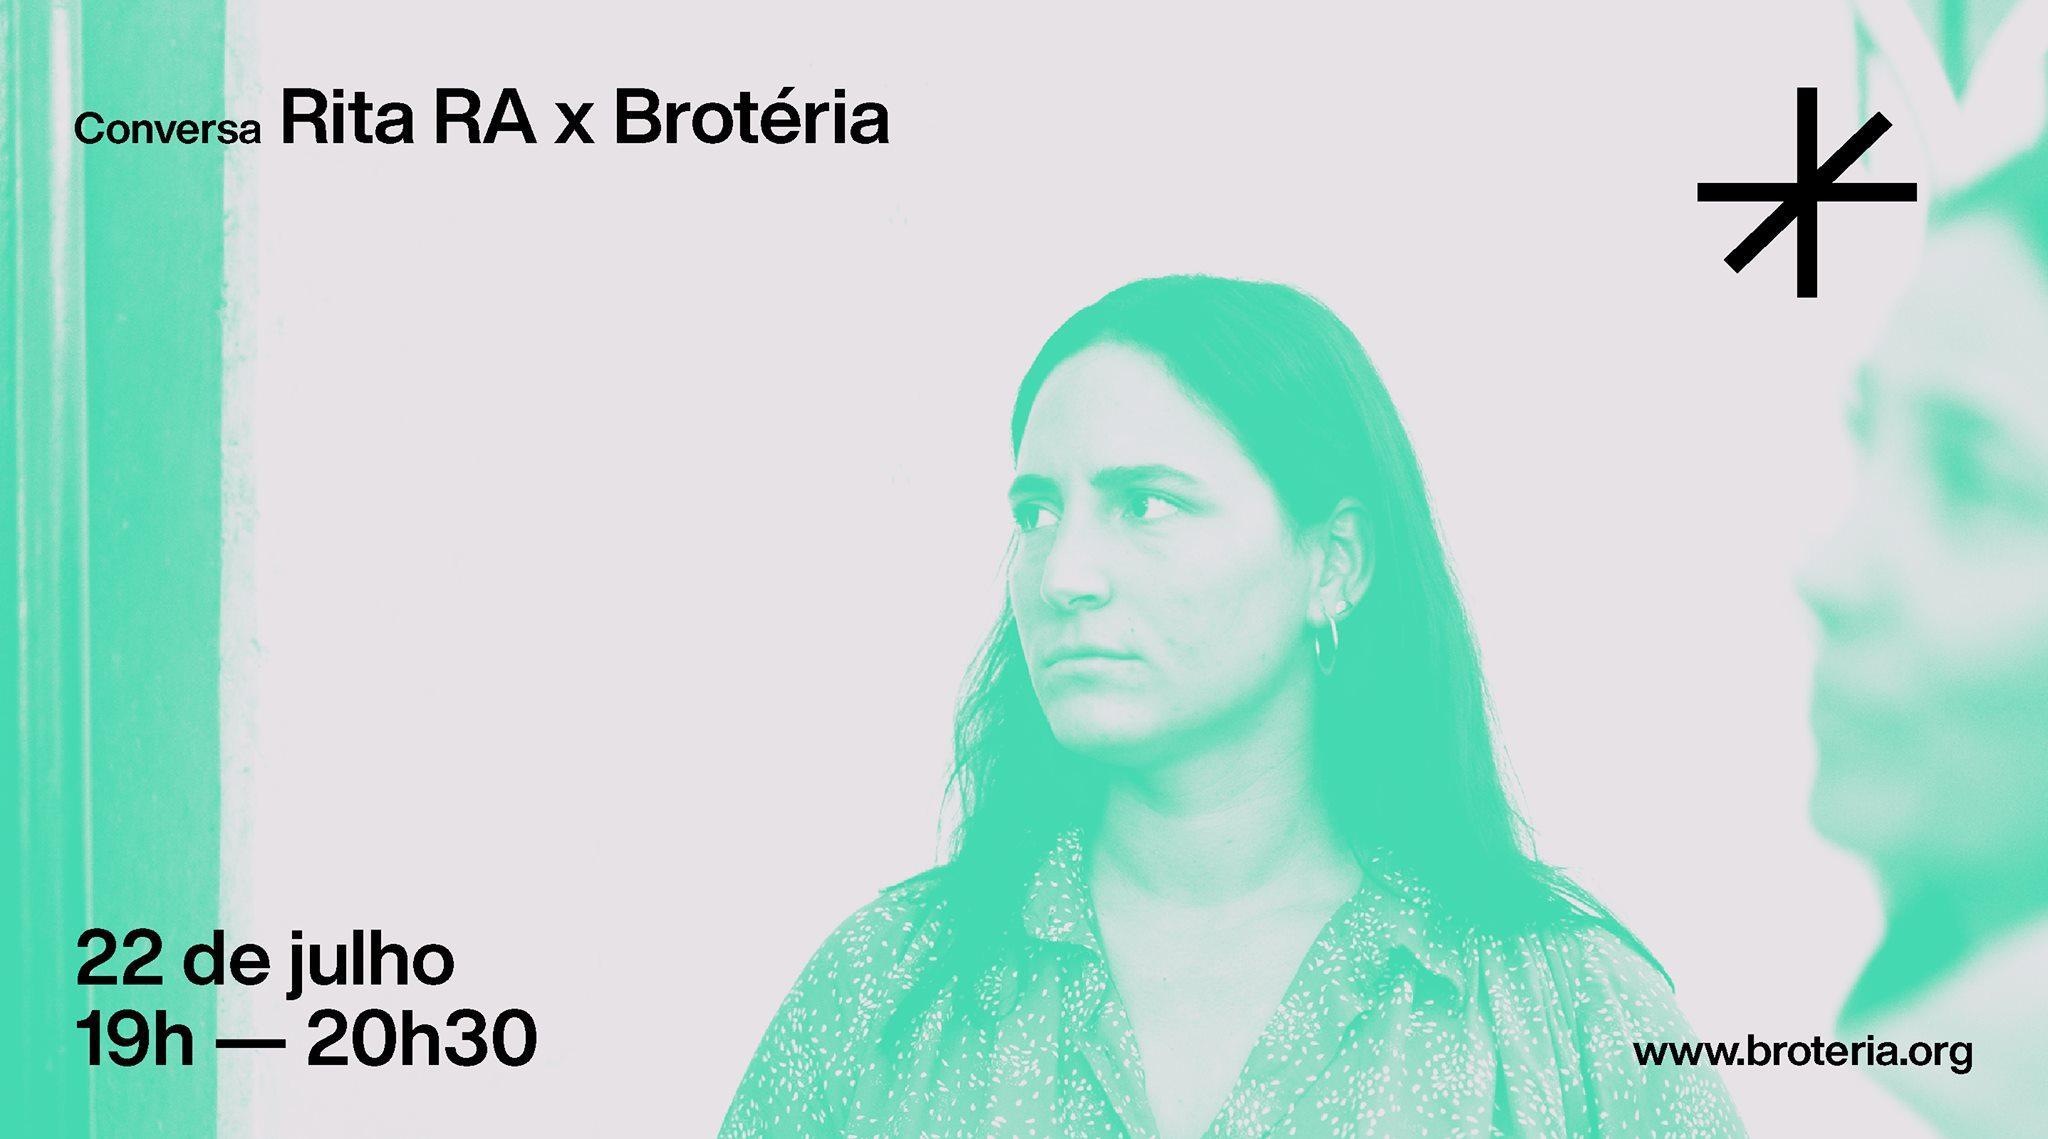 Conversa | Rita RA x Brotéria